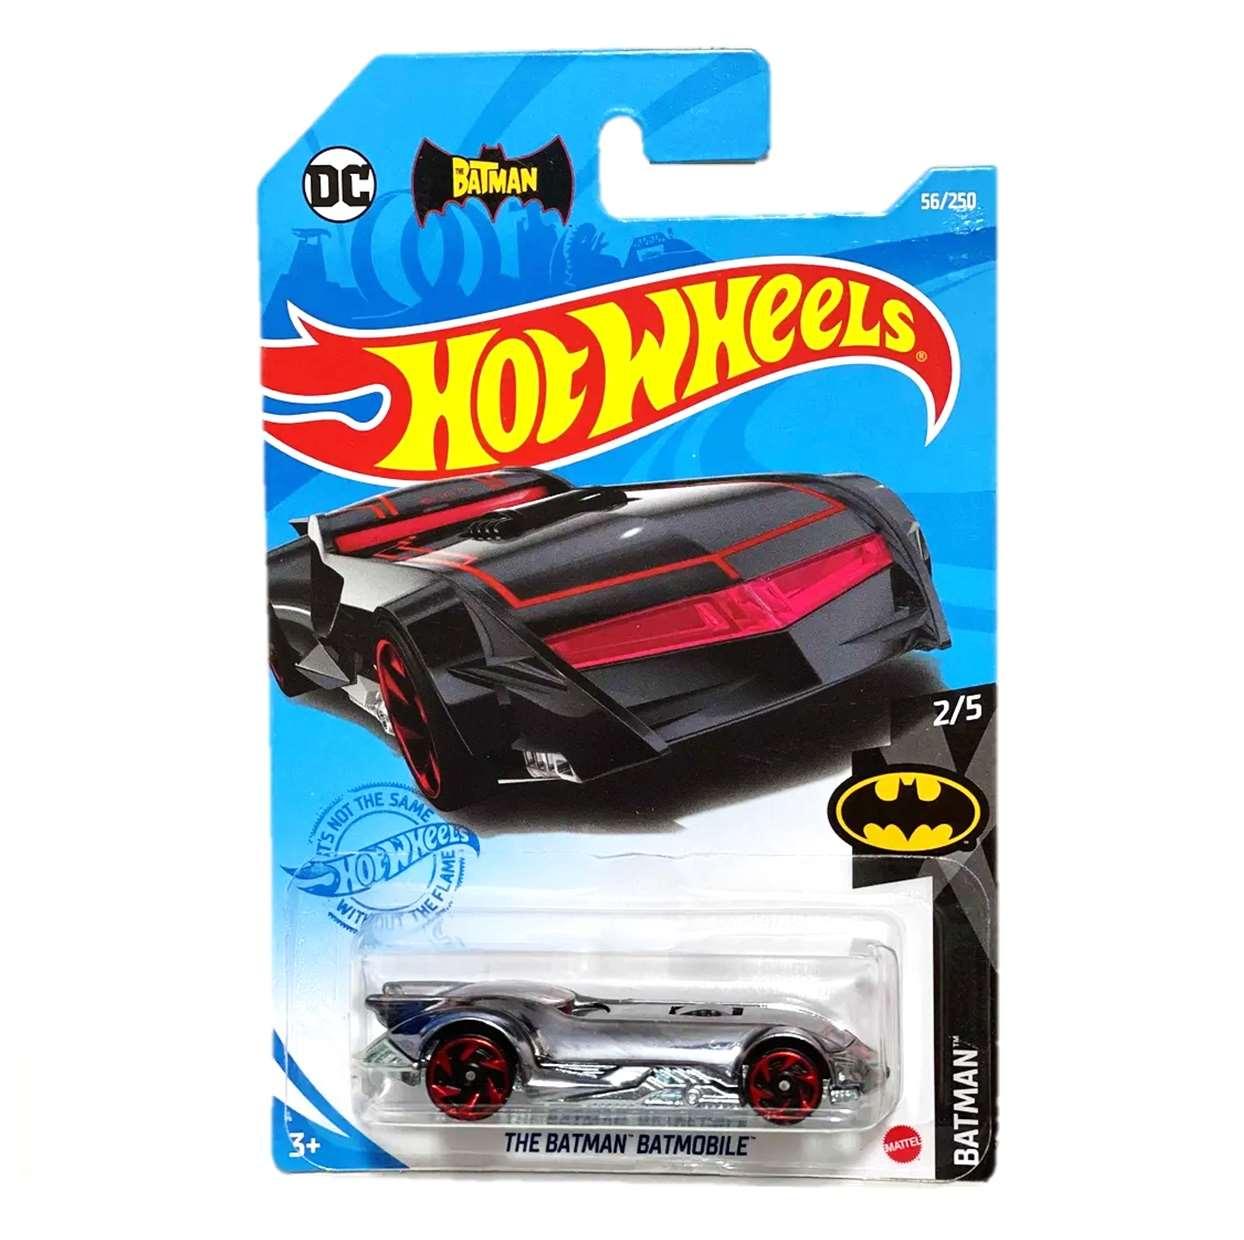 The Batman Batmobile 2/5 Hot Wheels The Batman 56/250